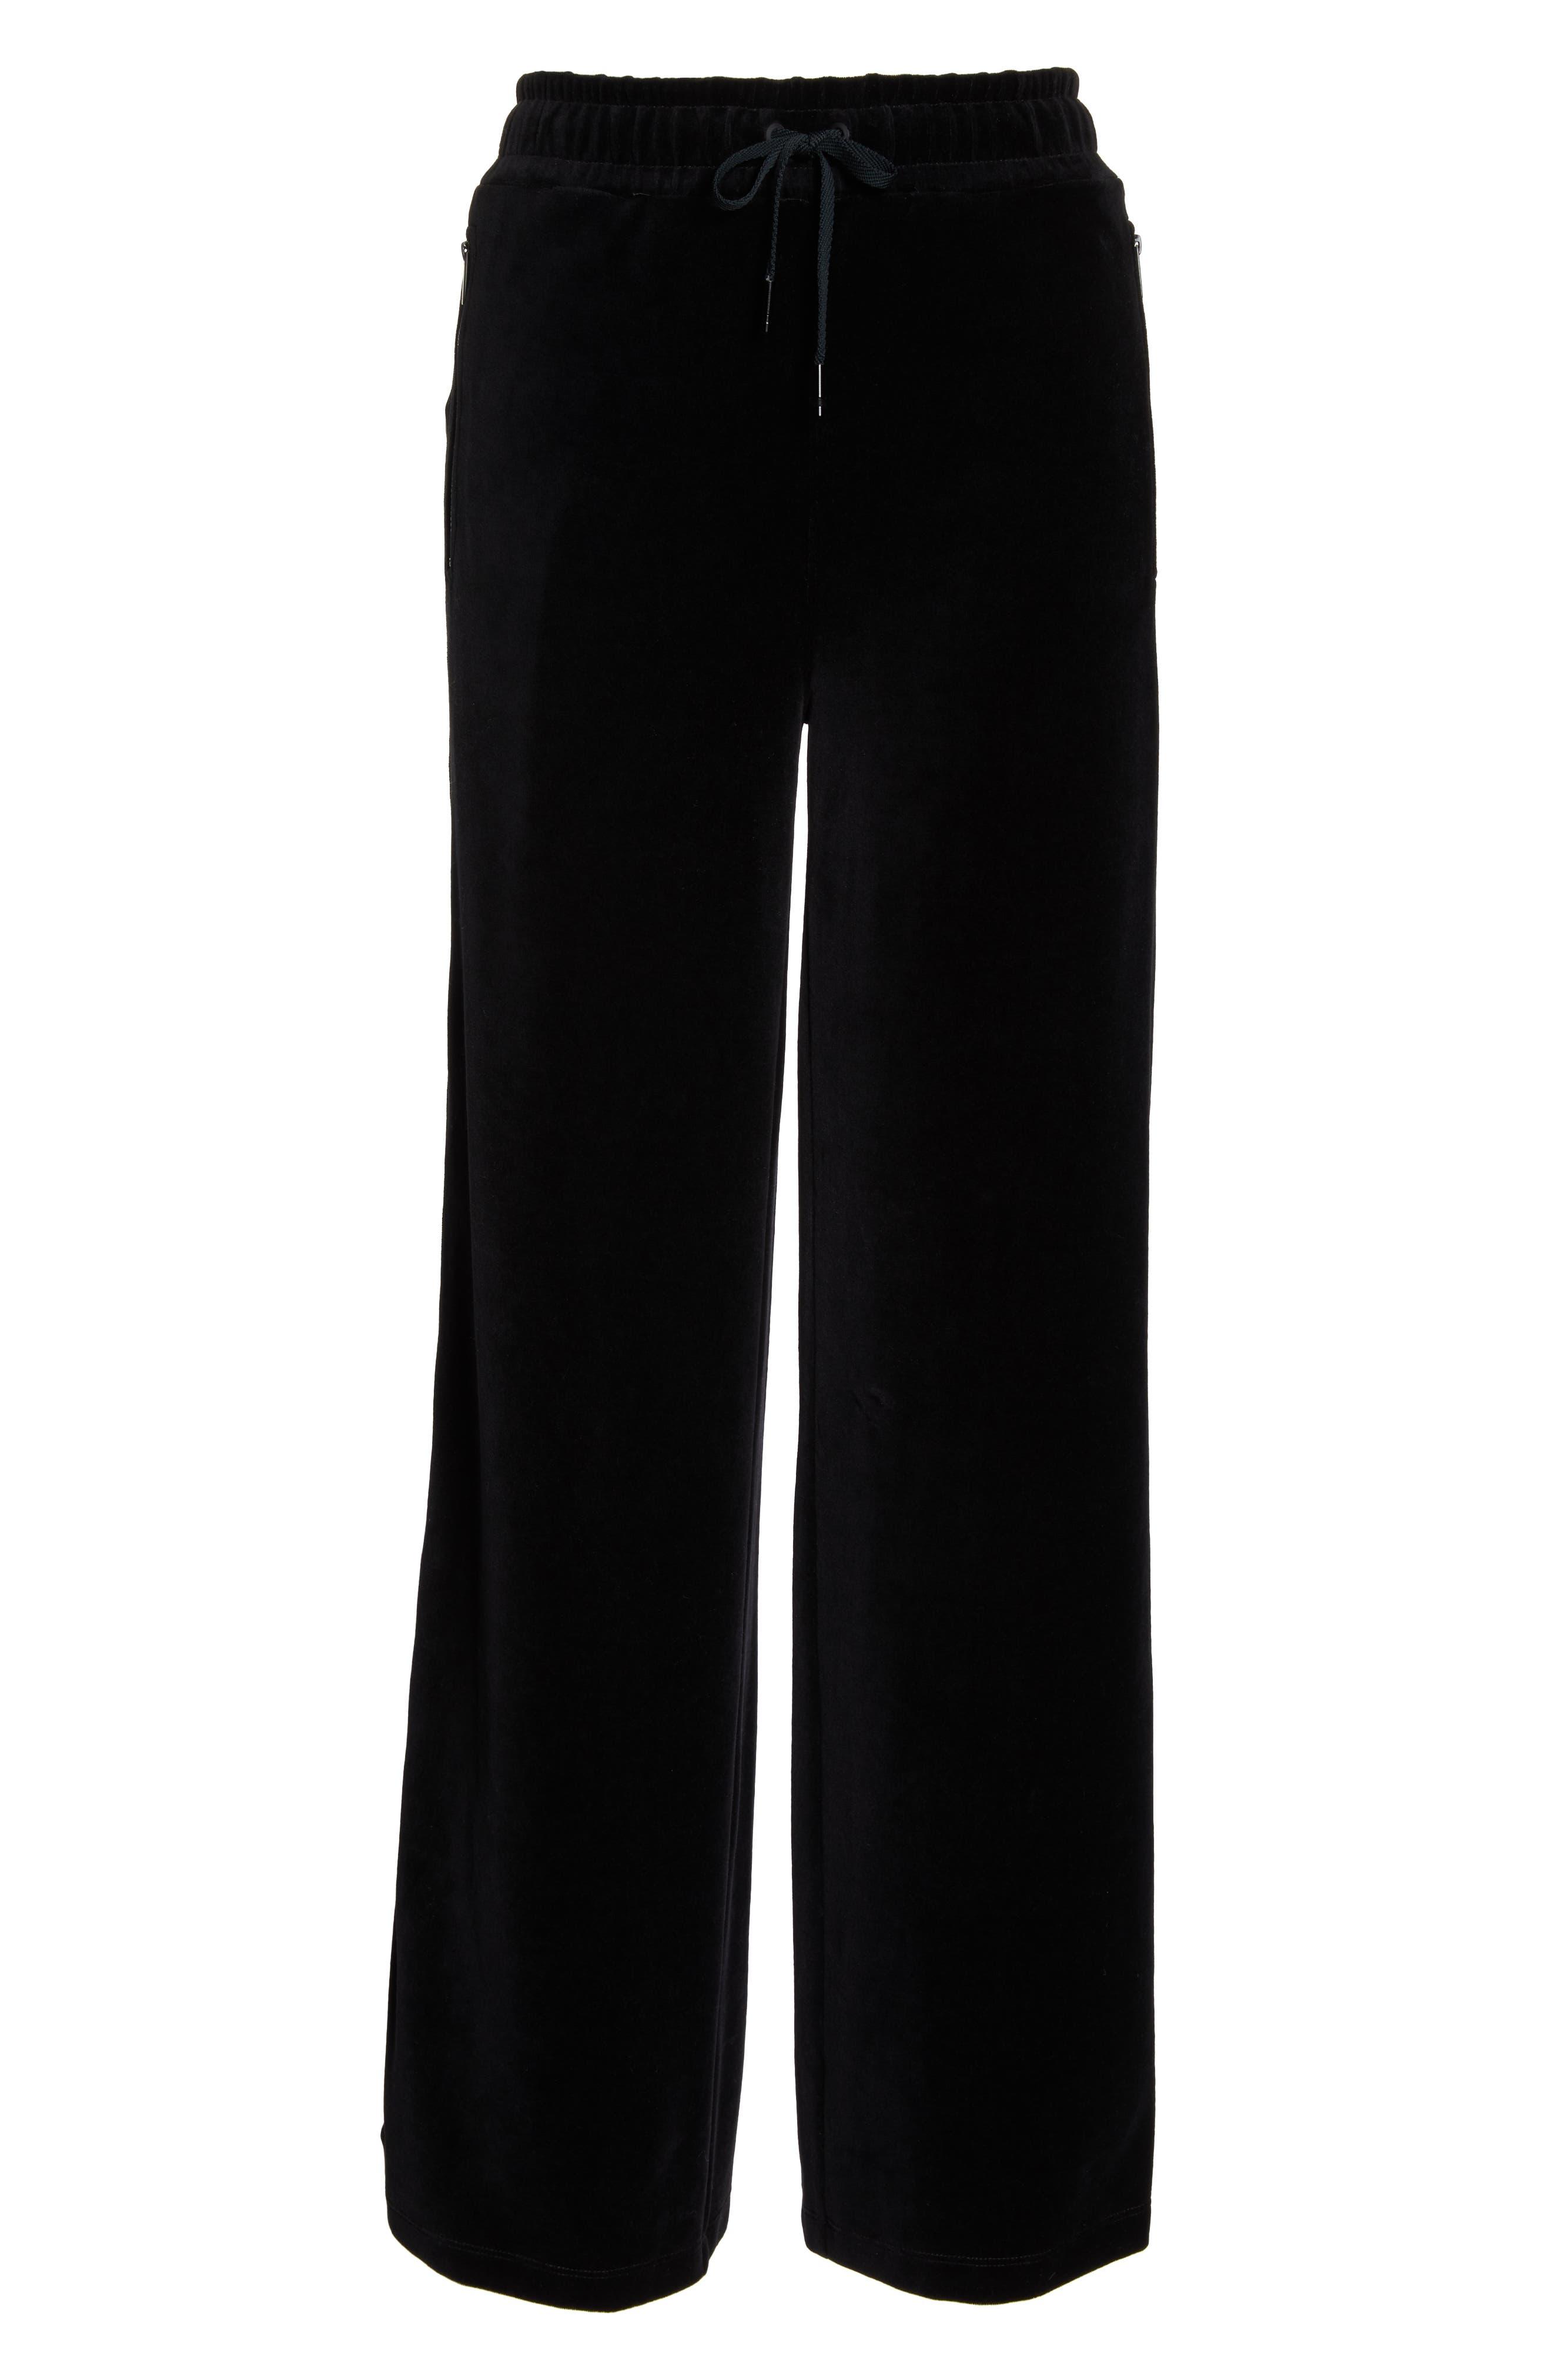 Liya Tear Away Pants,                             Alternate thumbnail 7, color,                             BLACK